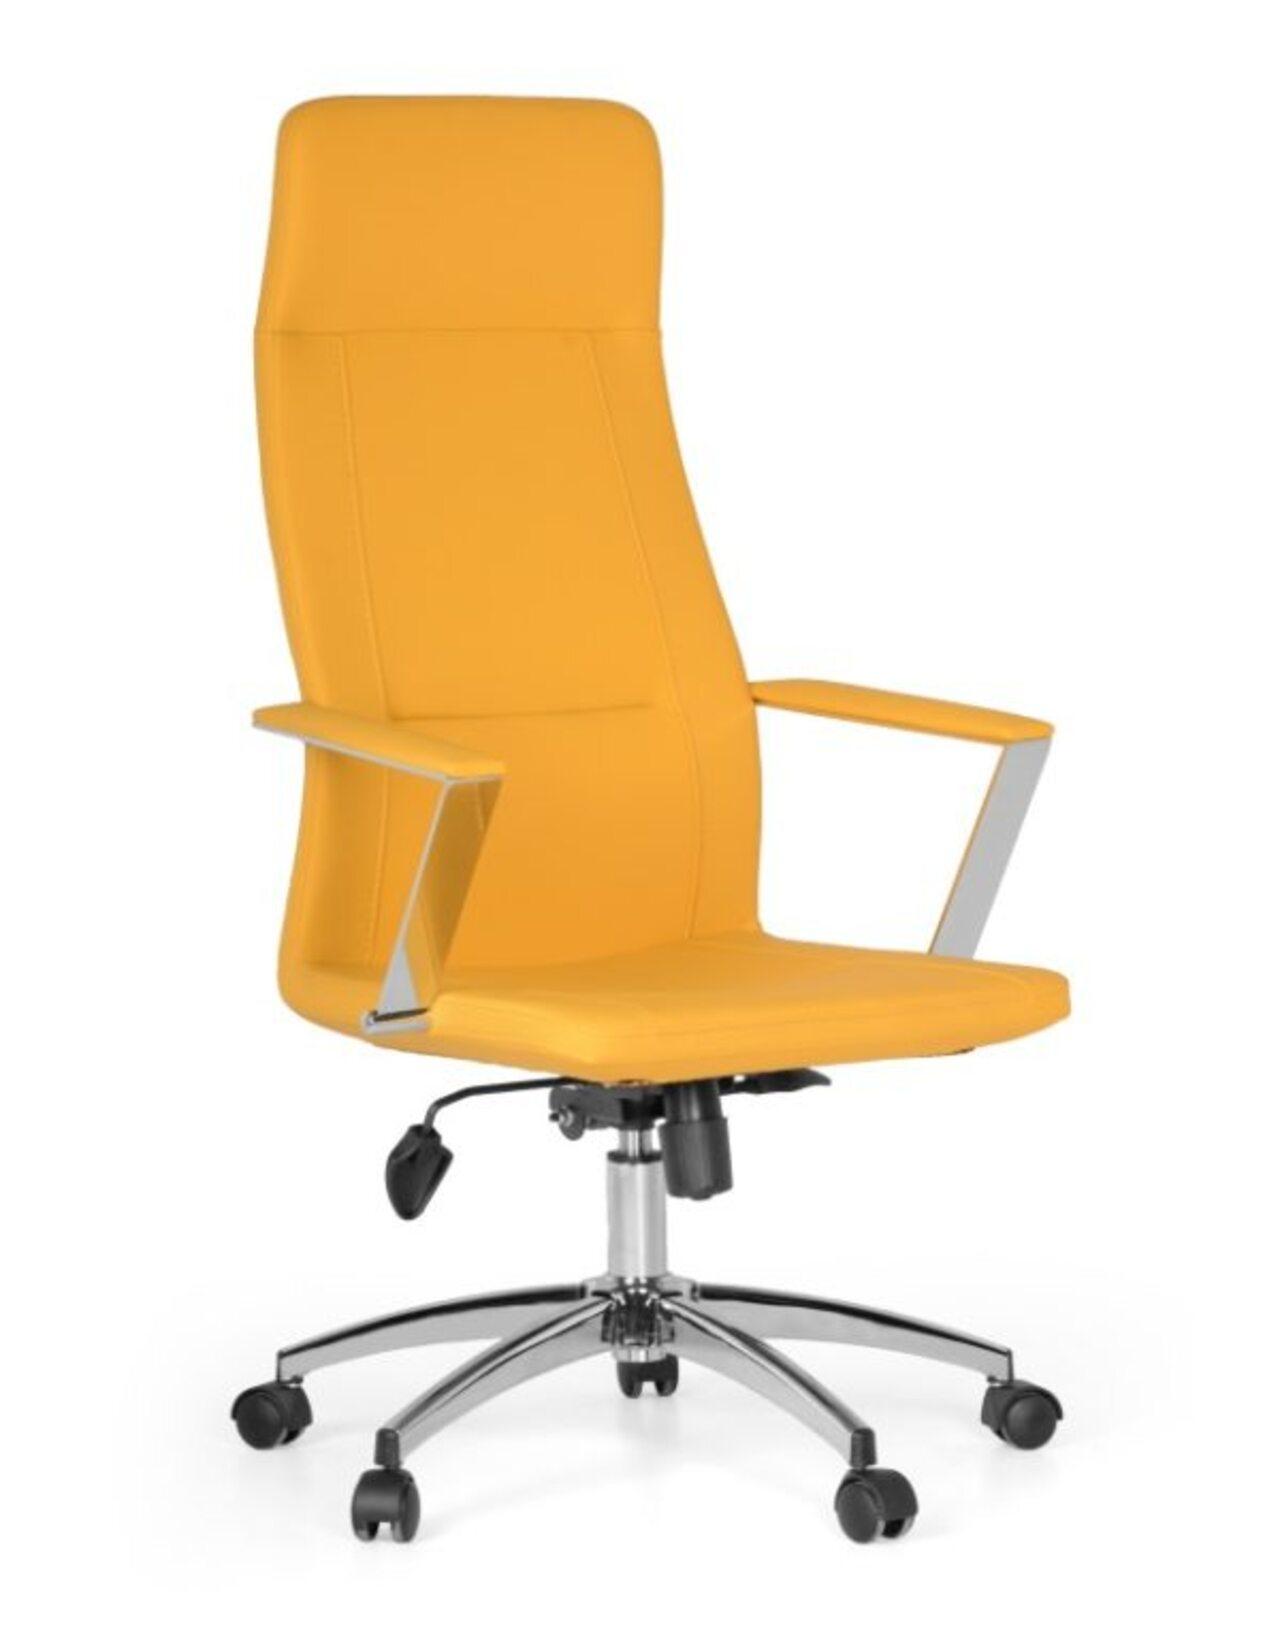 Кресло руководителя Леон ЛН-01 - фото 1